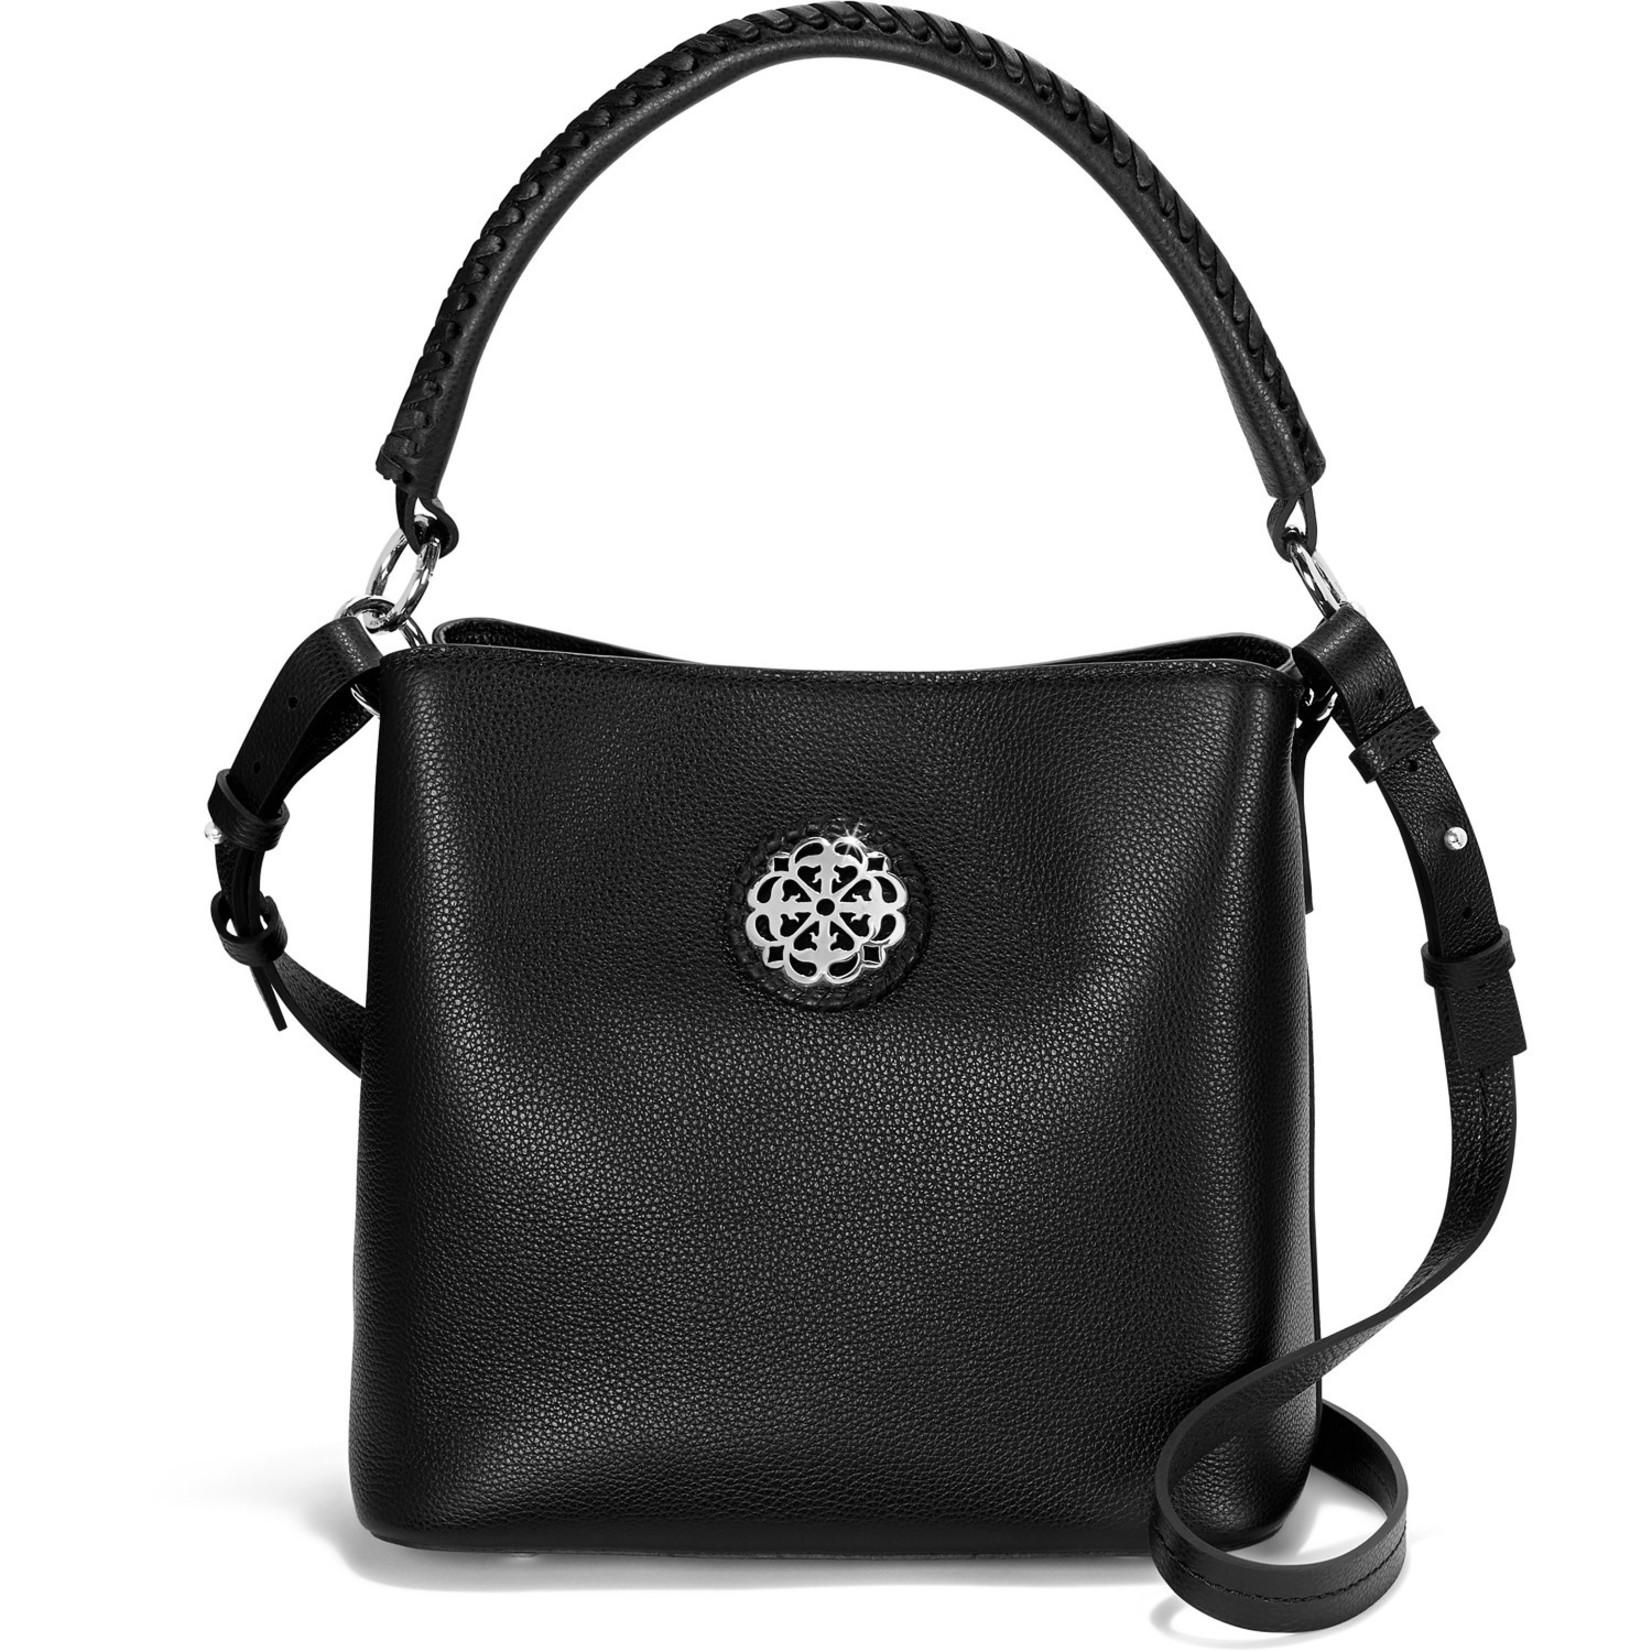 Brighton Noelle Cross Body Bucket Bag